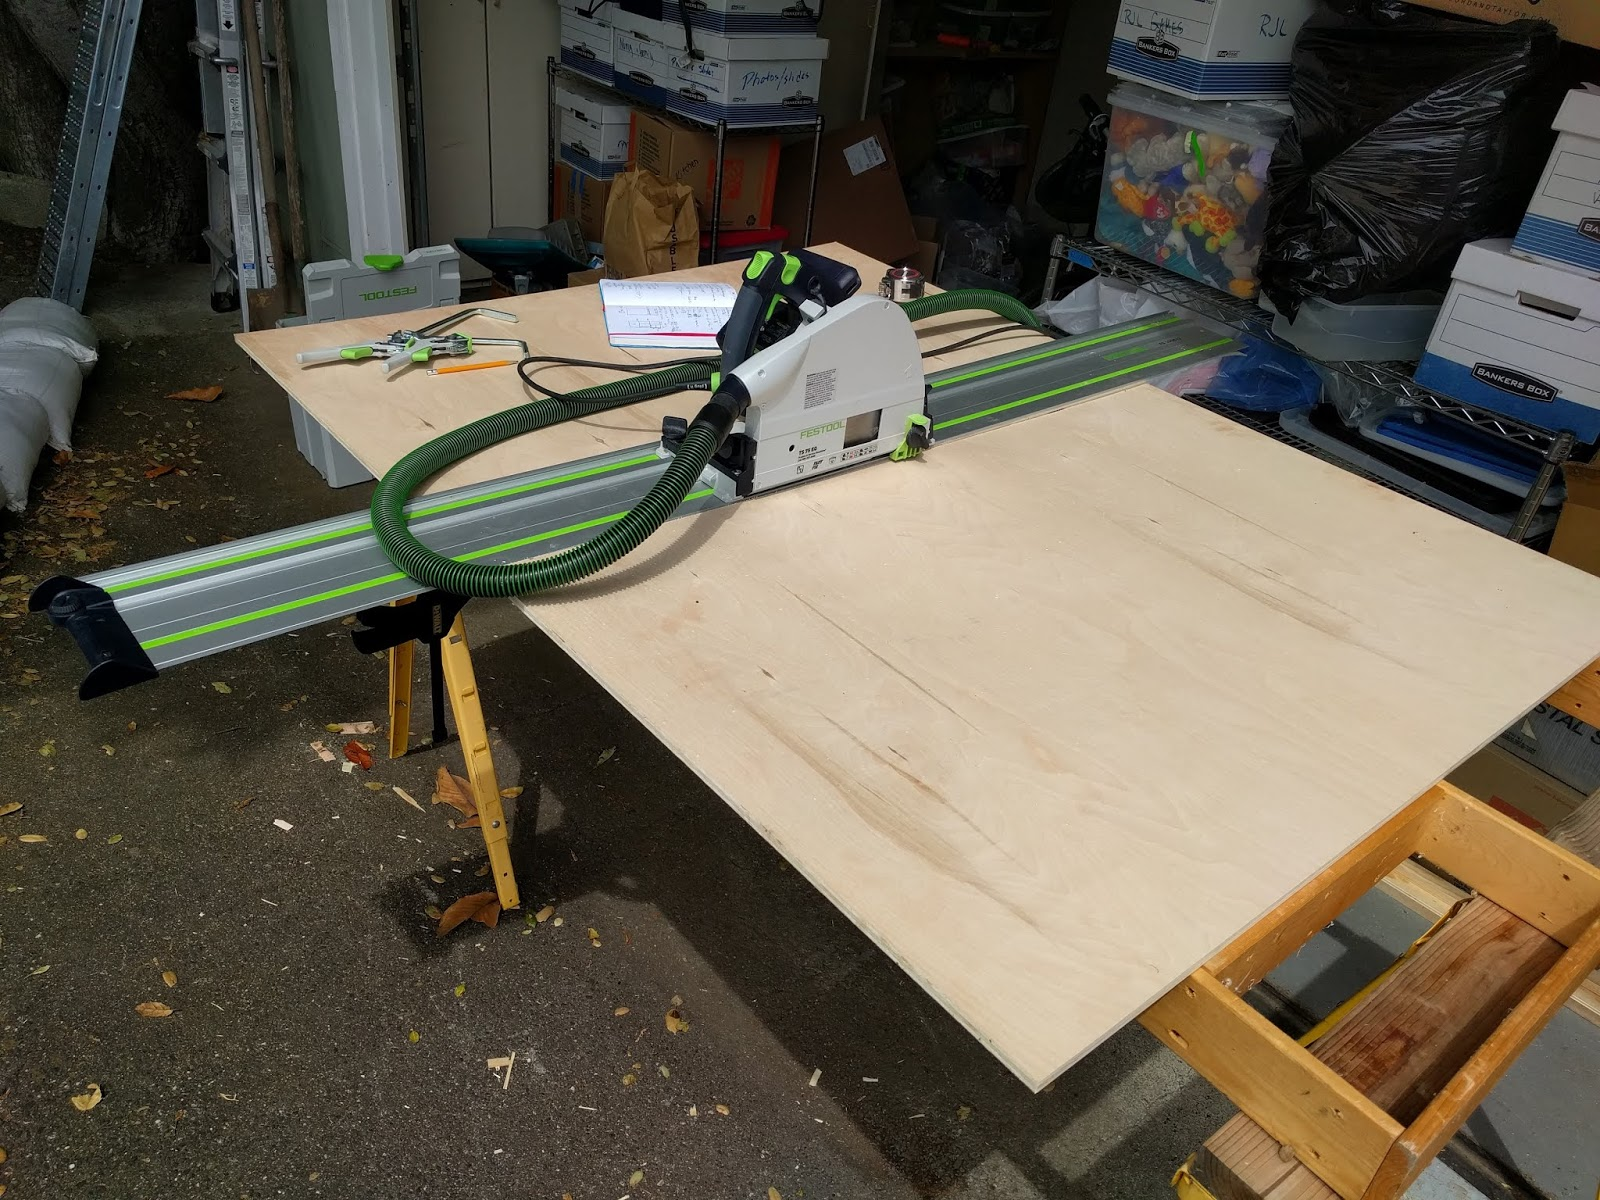 Microcarpentry: The Makita Cordless Track Saw